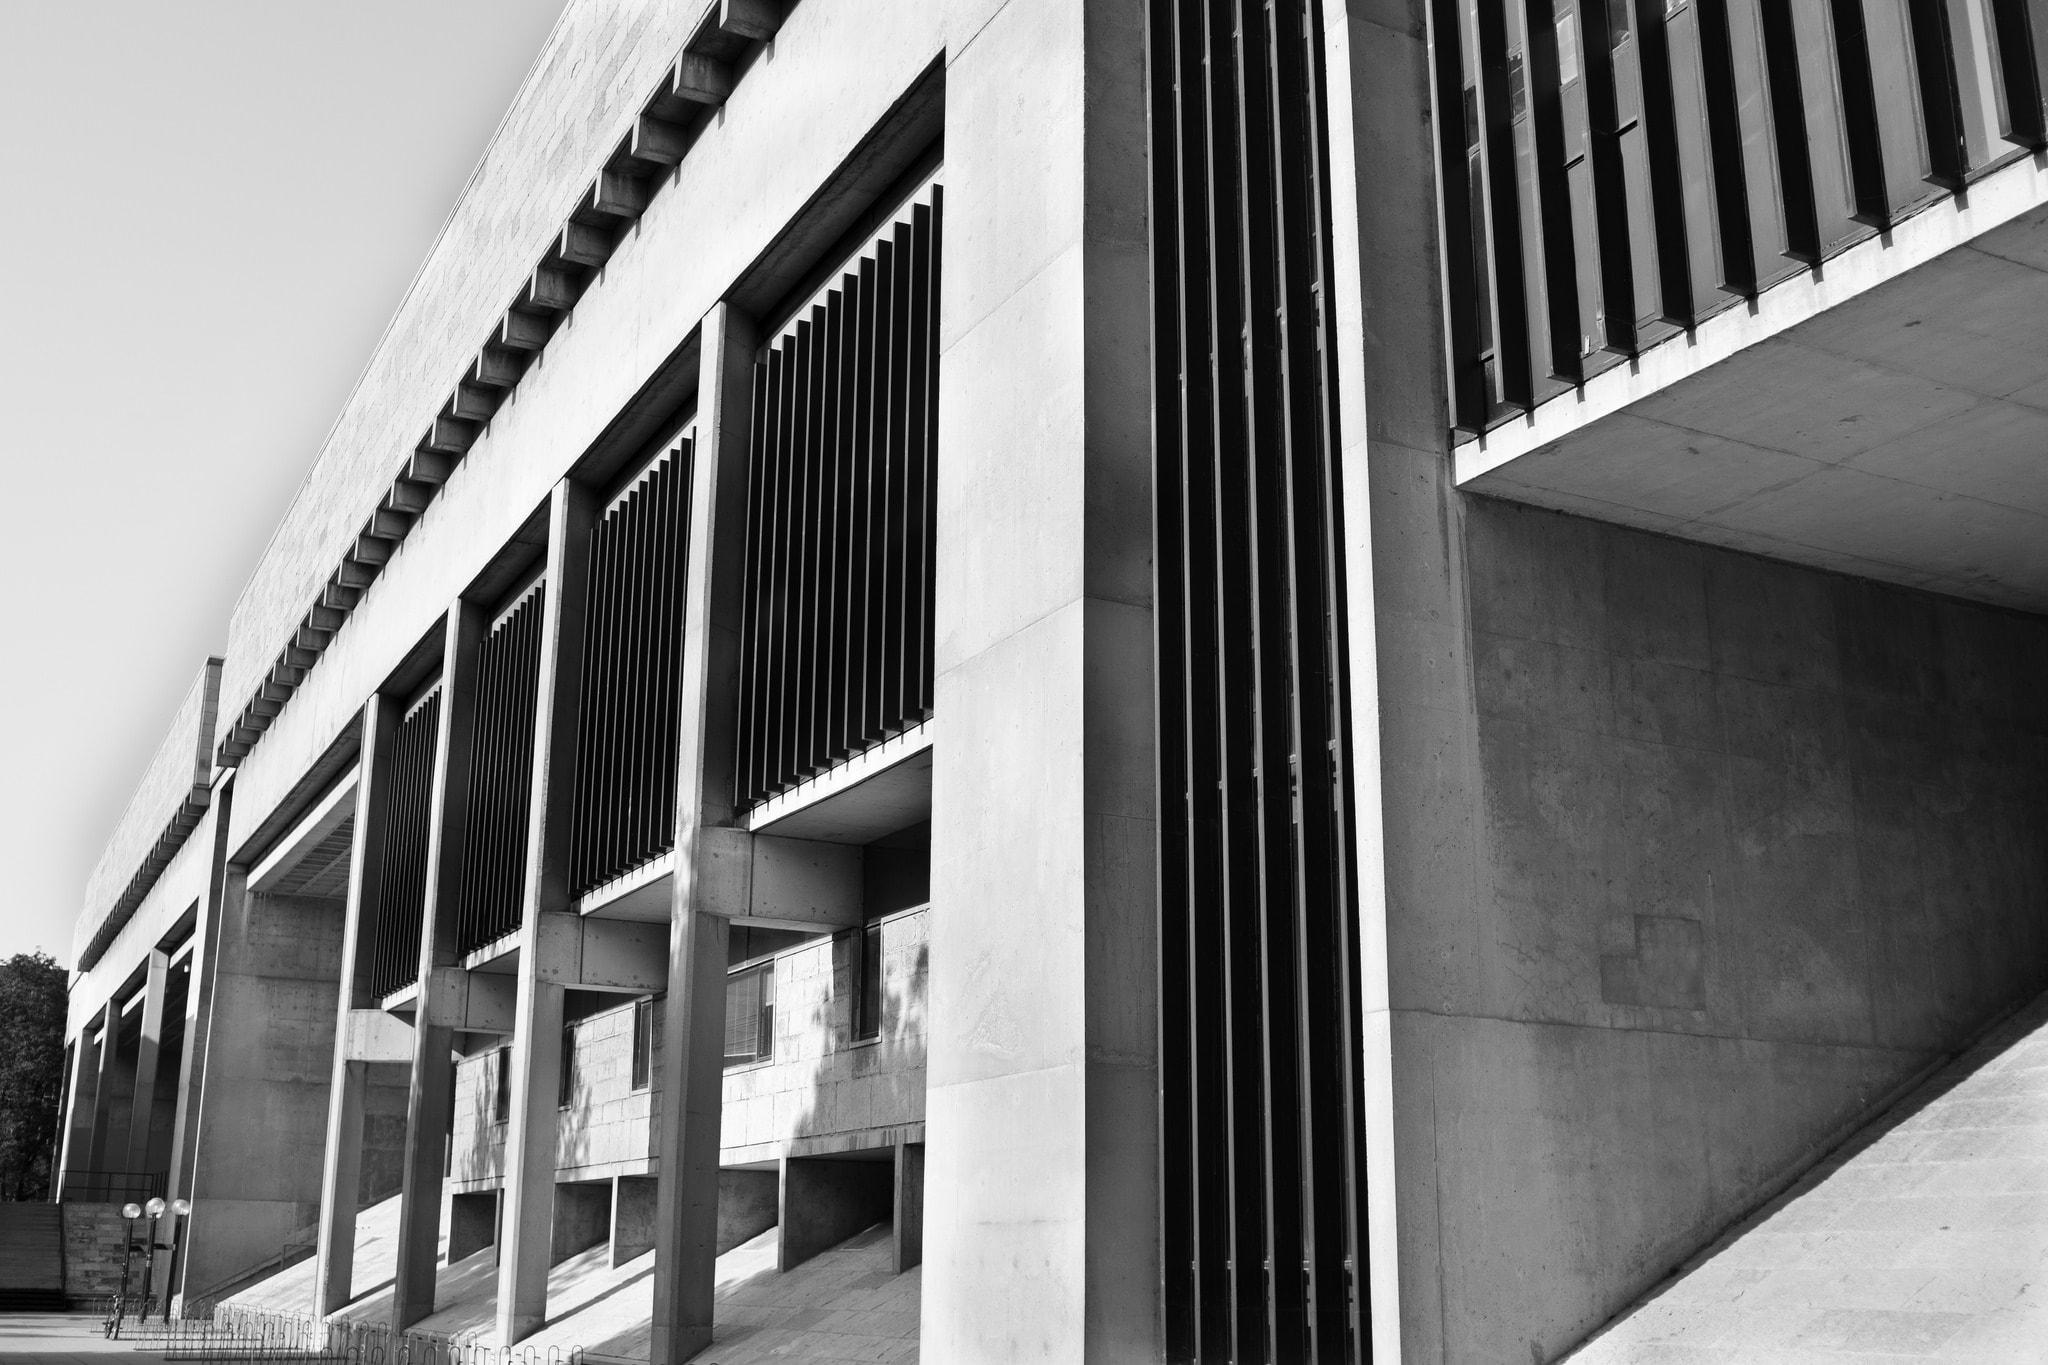 George L. Mosse Humanities Building | © Phil Roeder/flickr